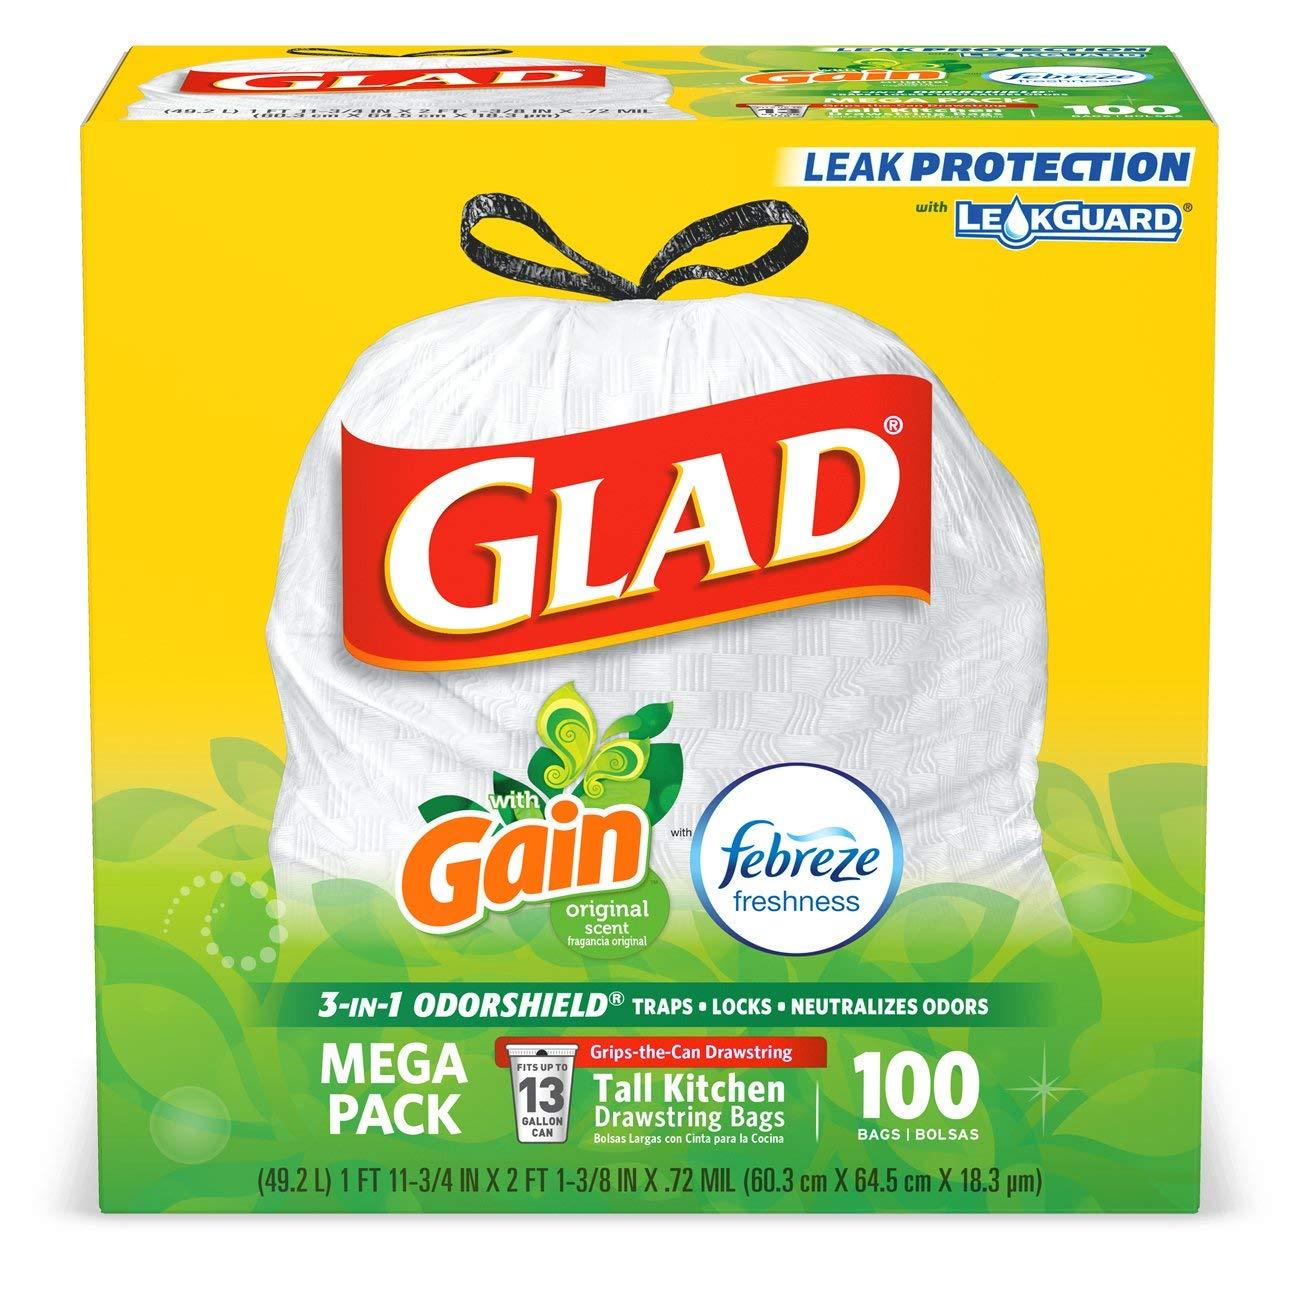 6-Pack 75oz Persil ProClean Liquid Laundry Detergent (Original) $36.25 w/ S&S & More + Free S&H